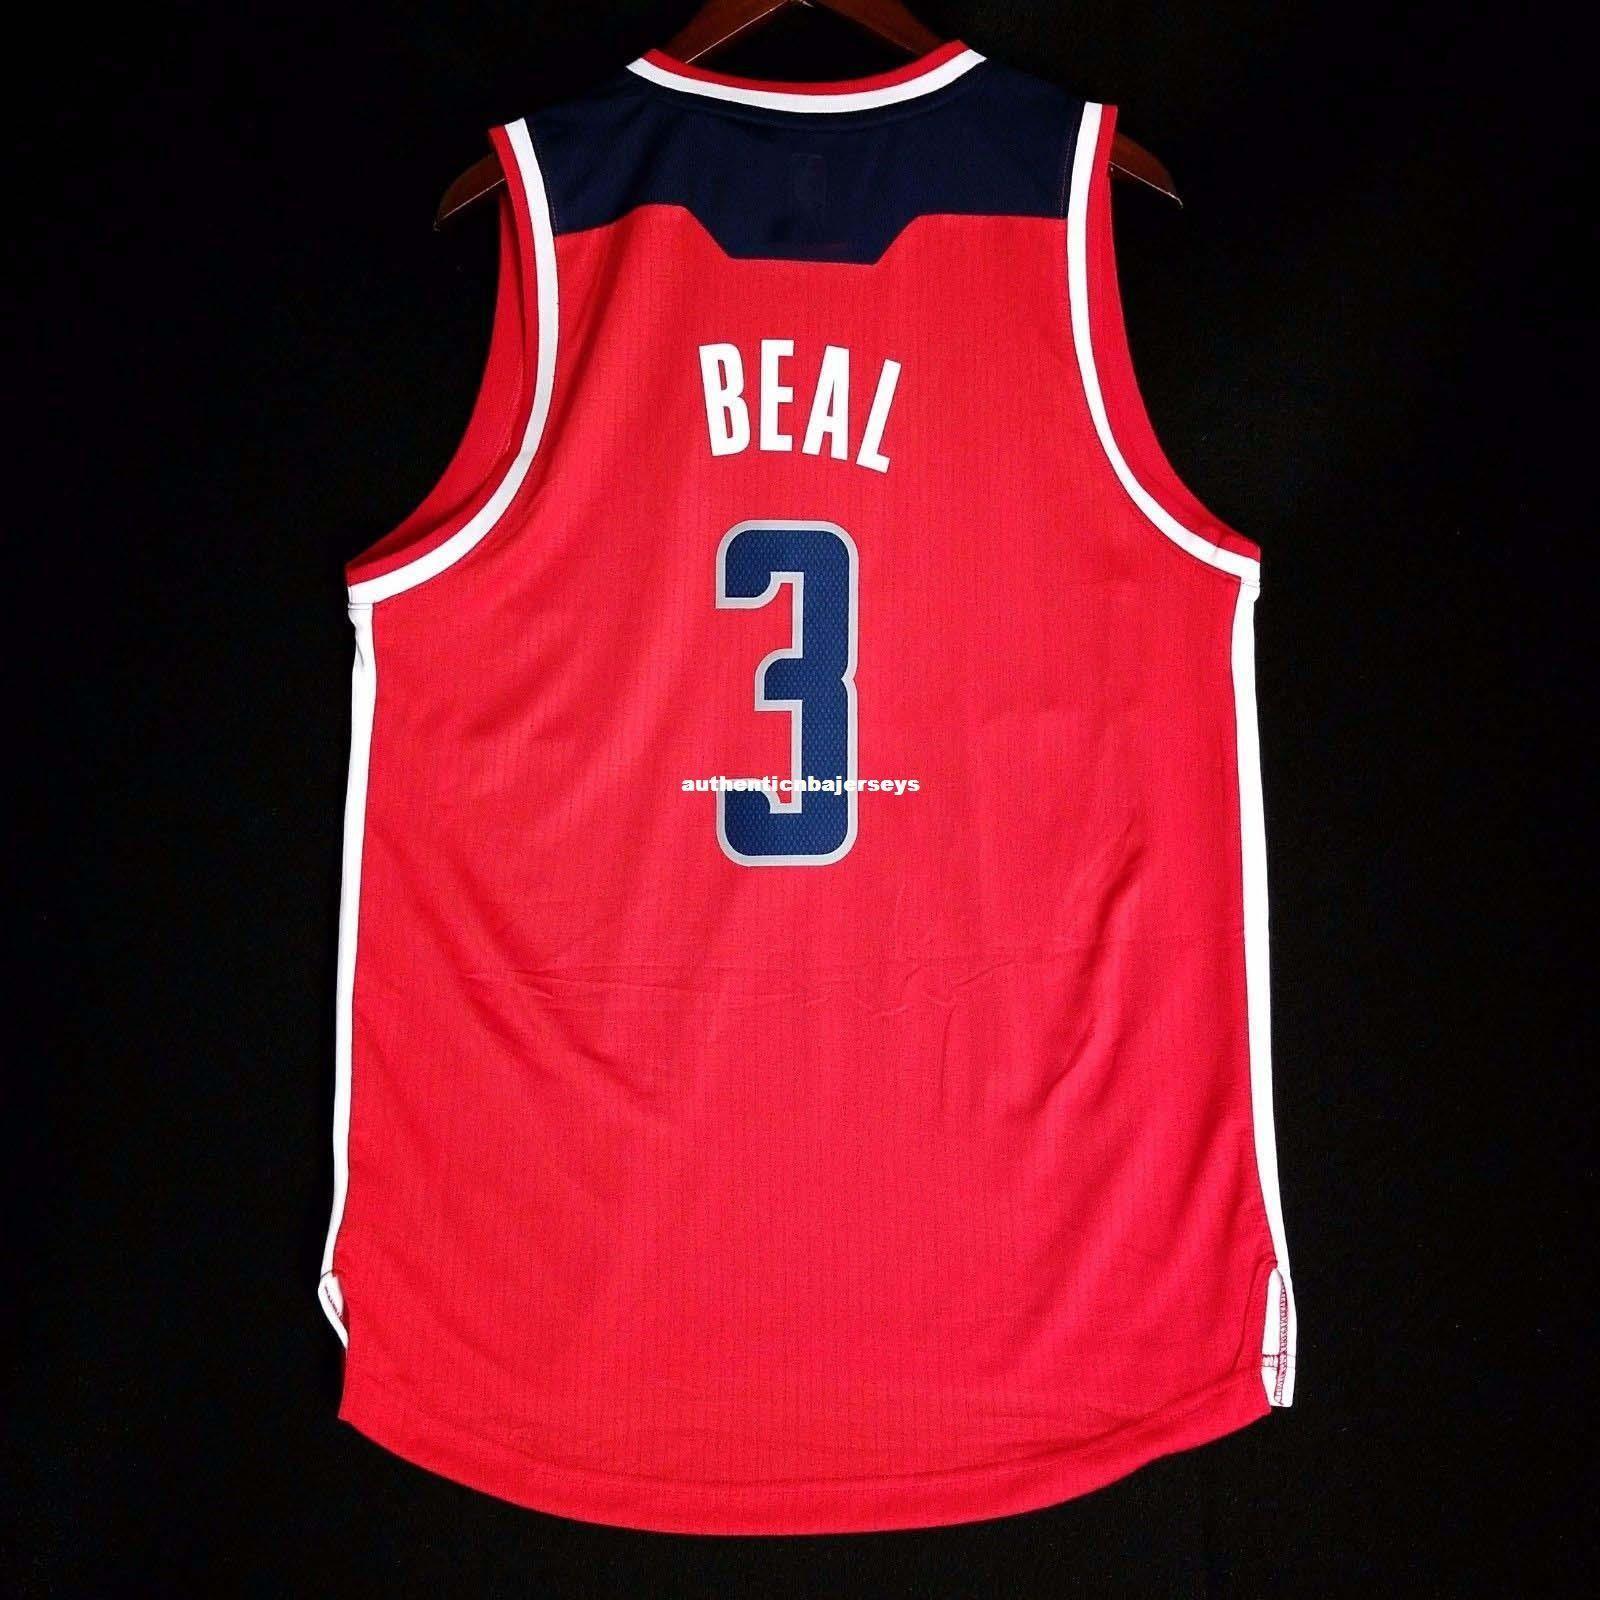 100% Stitched Bradley Beal Sewn vest Jersey Red wall john Mens Vest Size XS-6XL Stitched basketball Jerseys Ncaa